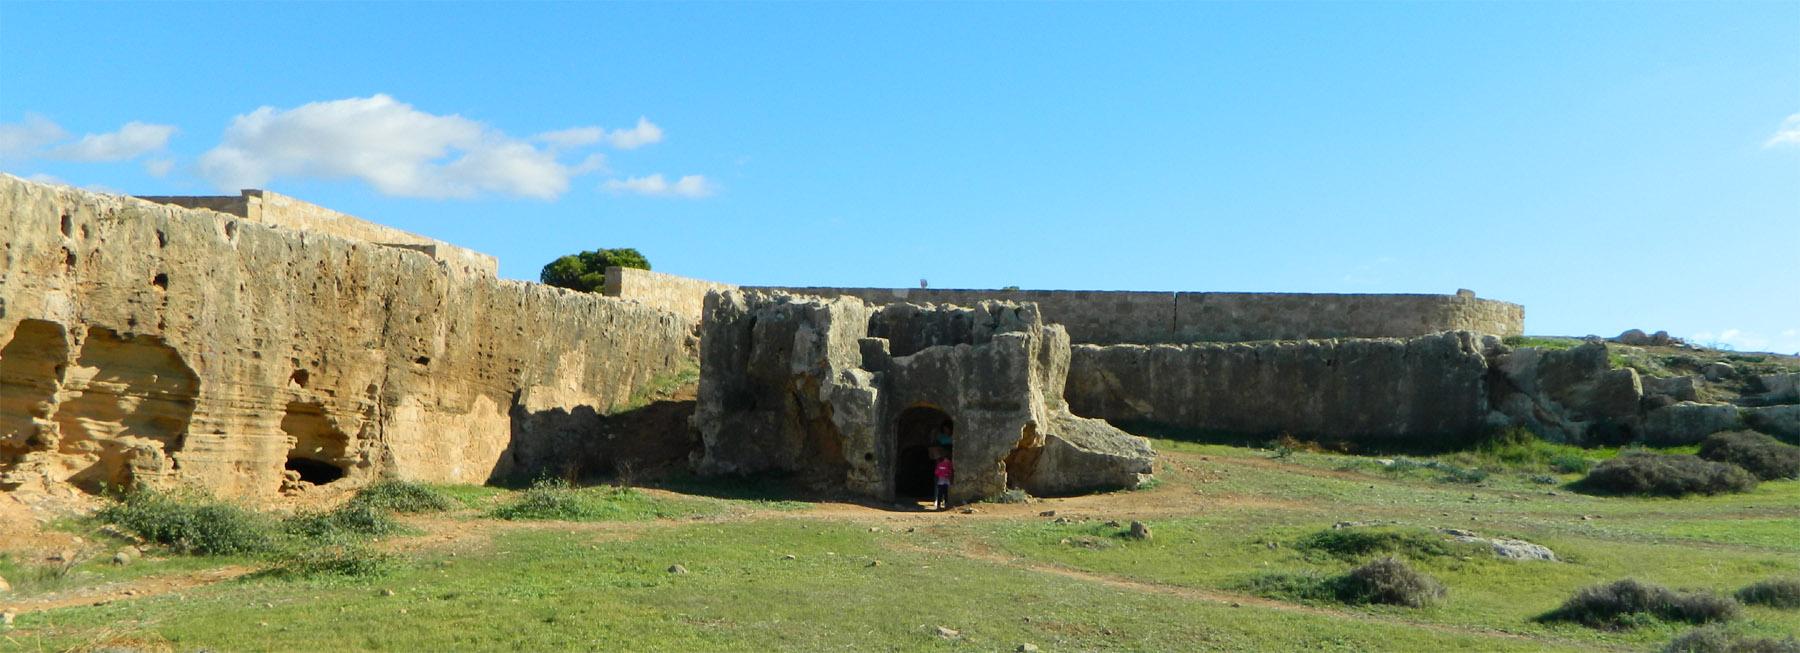 Grobowce Królewskie